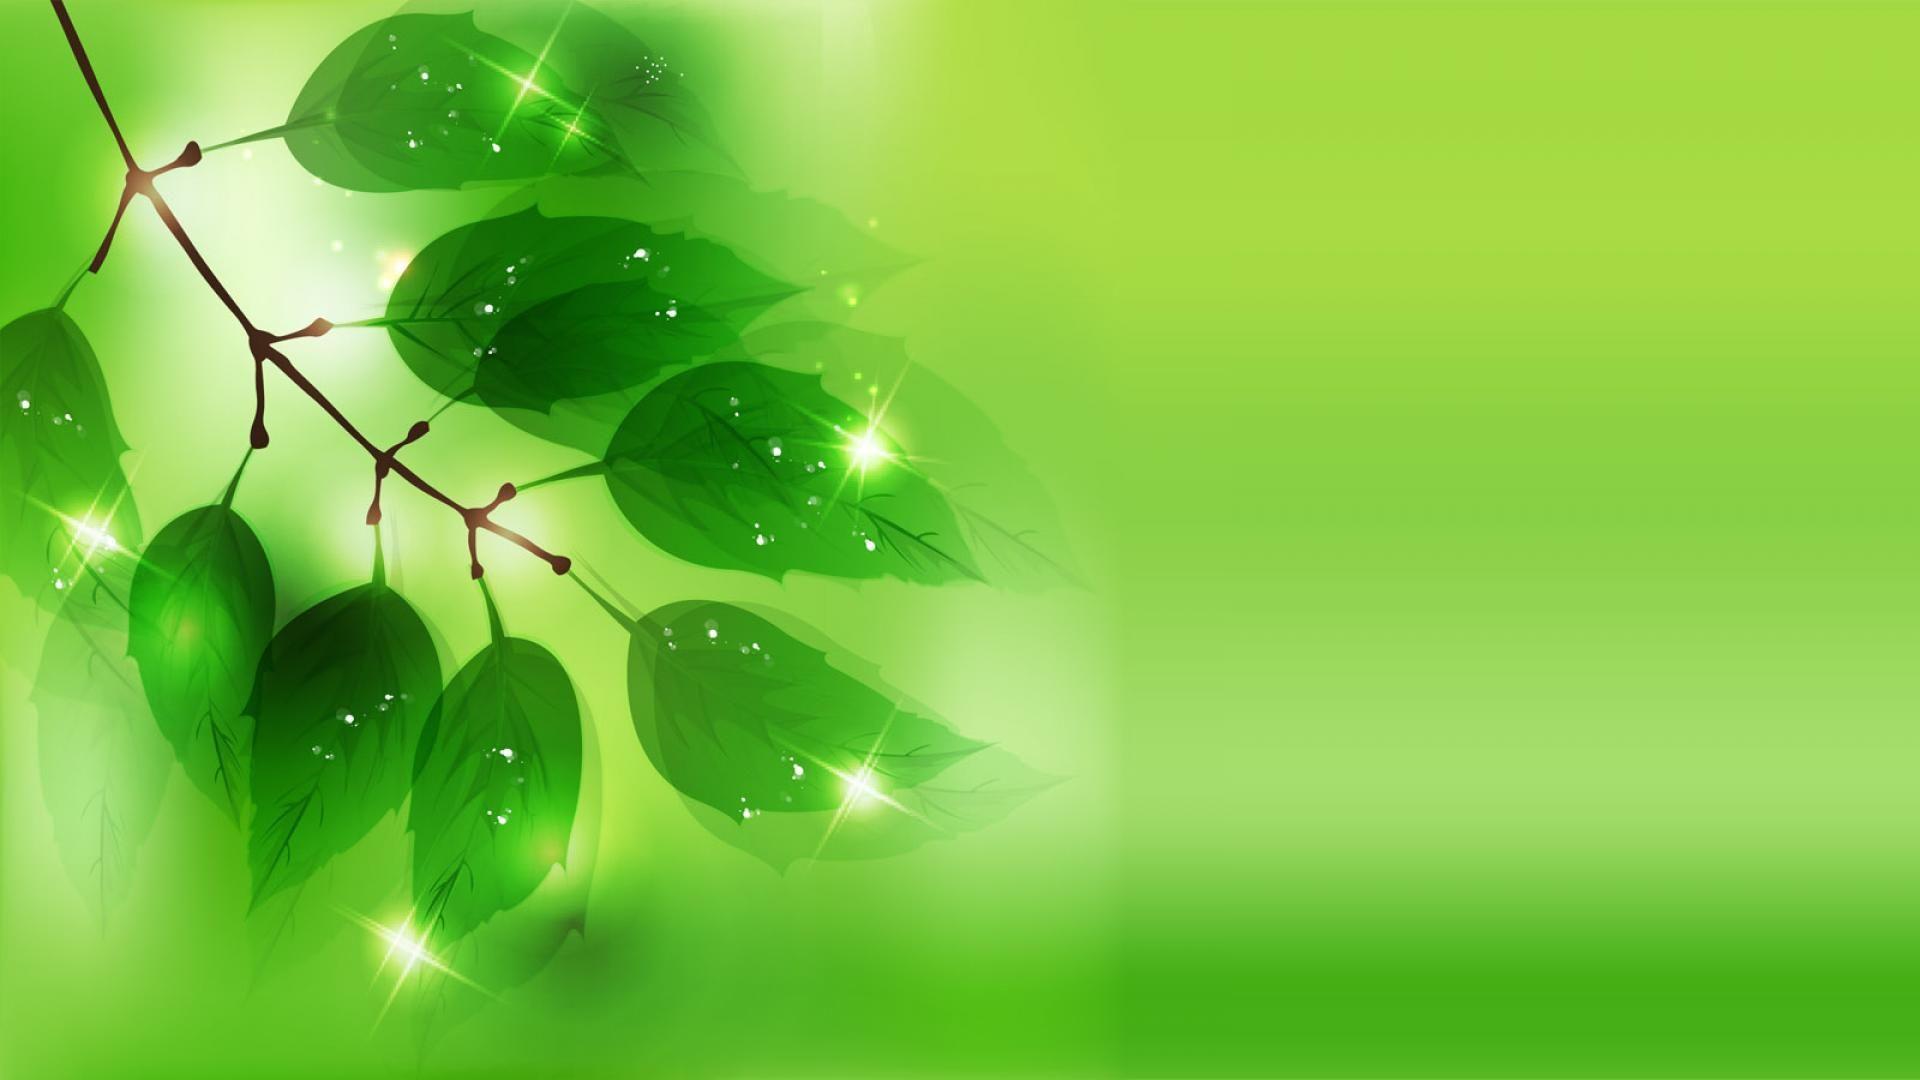 Green Vector Wallpapers   Top Free Green Vector Backgrounds ...